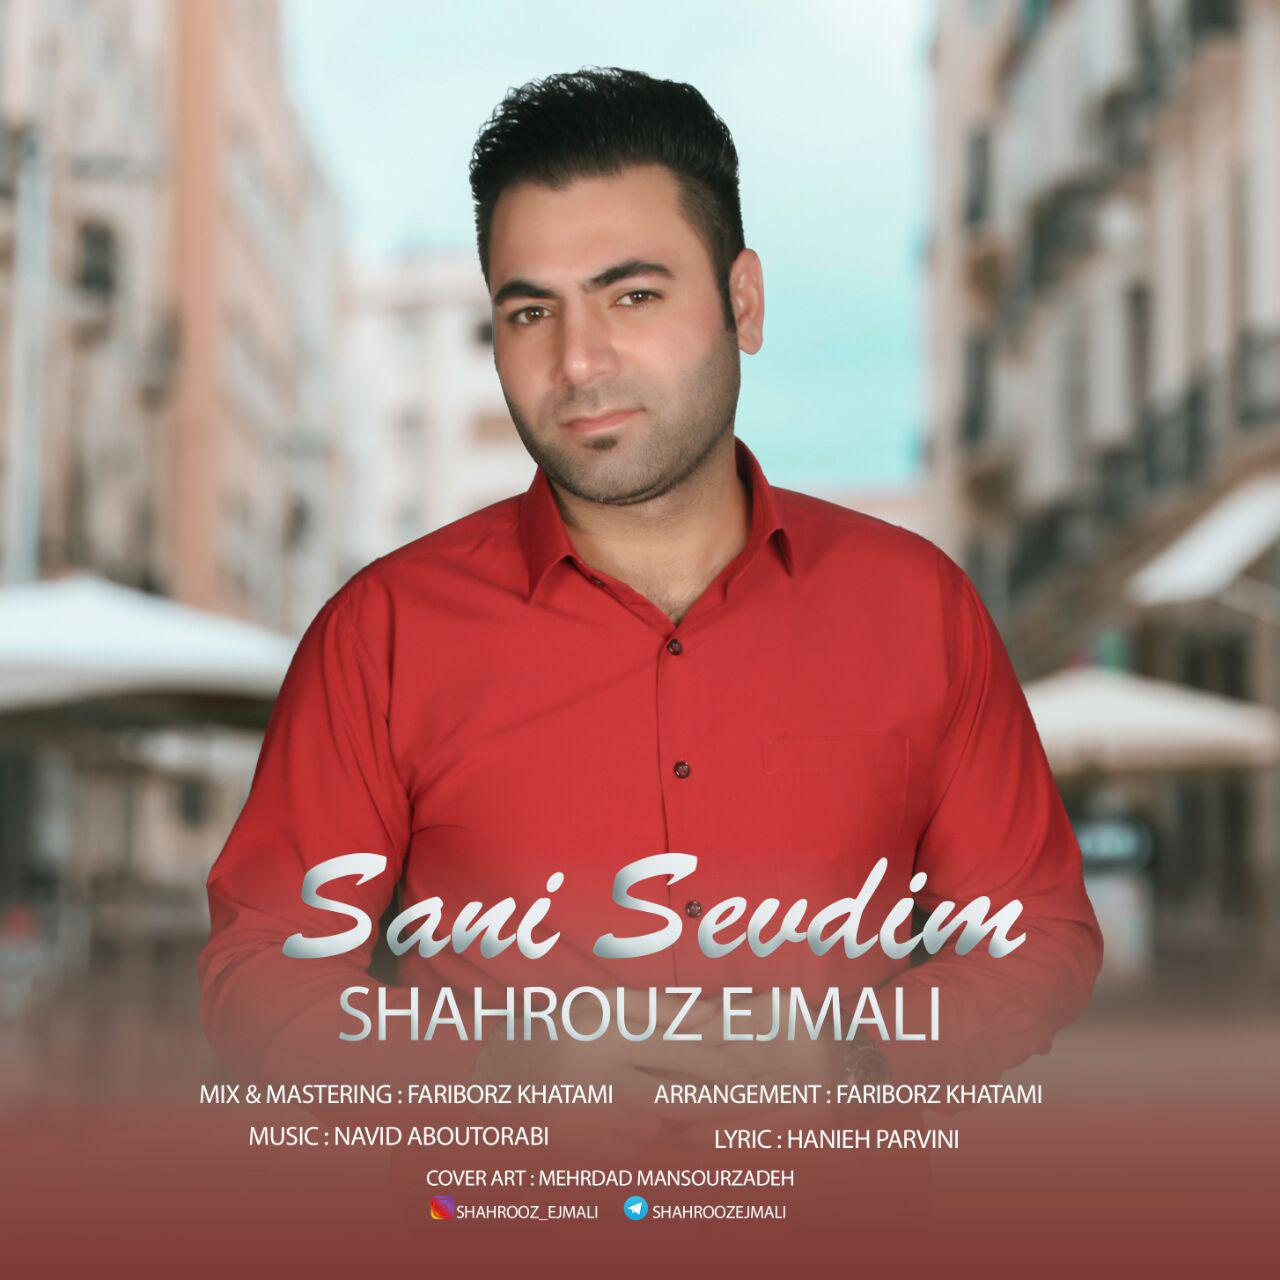 http://s8.picofile.com/file/8314836384/17Shahrouz_Ejmali_Sani_Sevdim.jpg